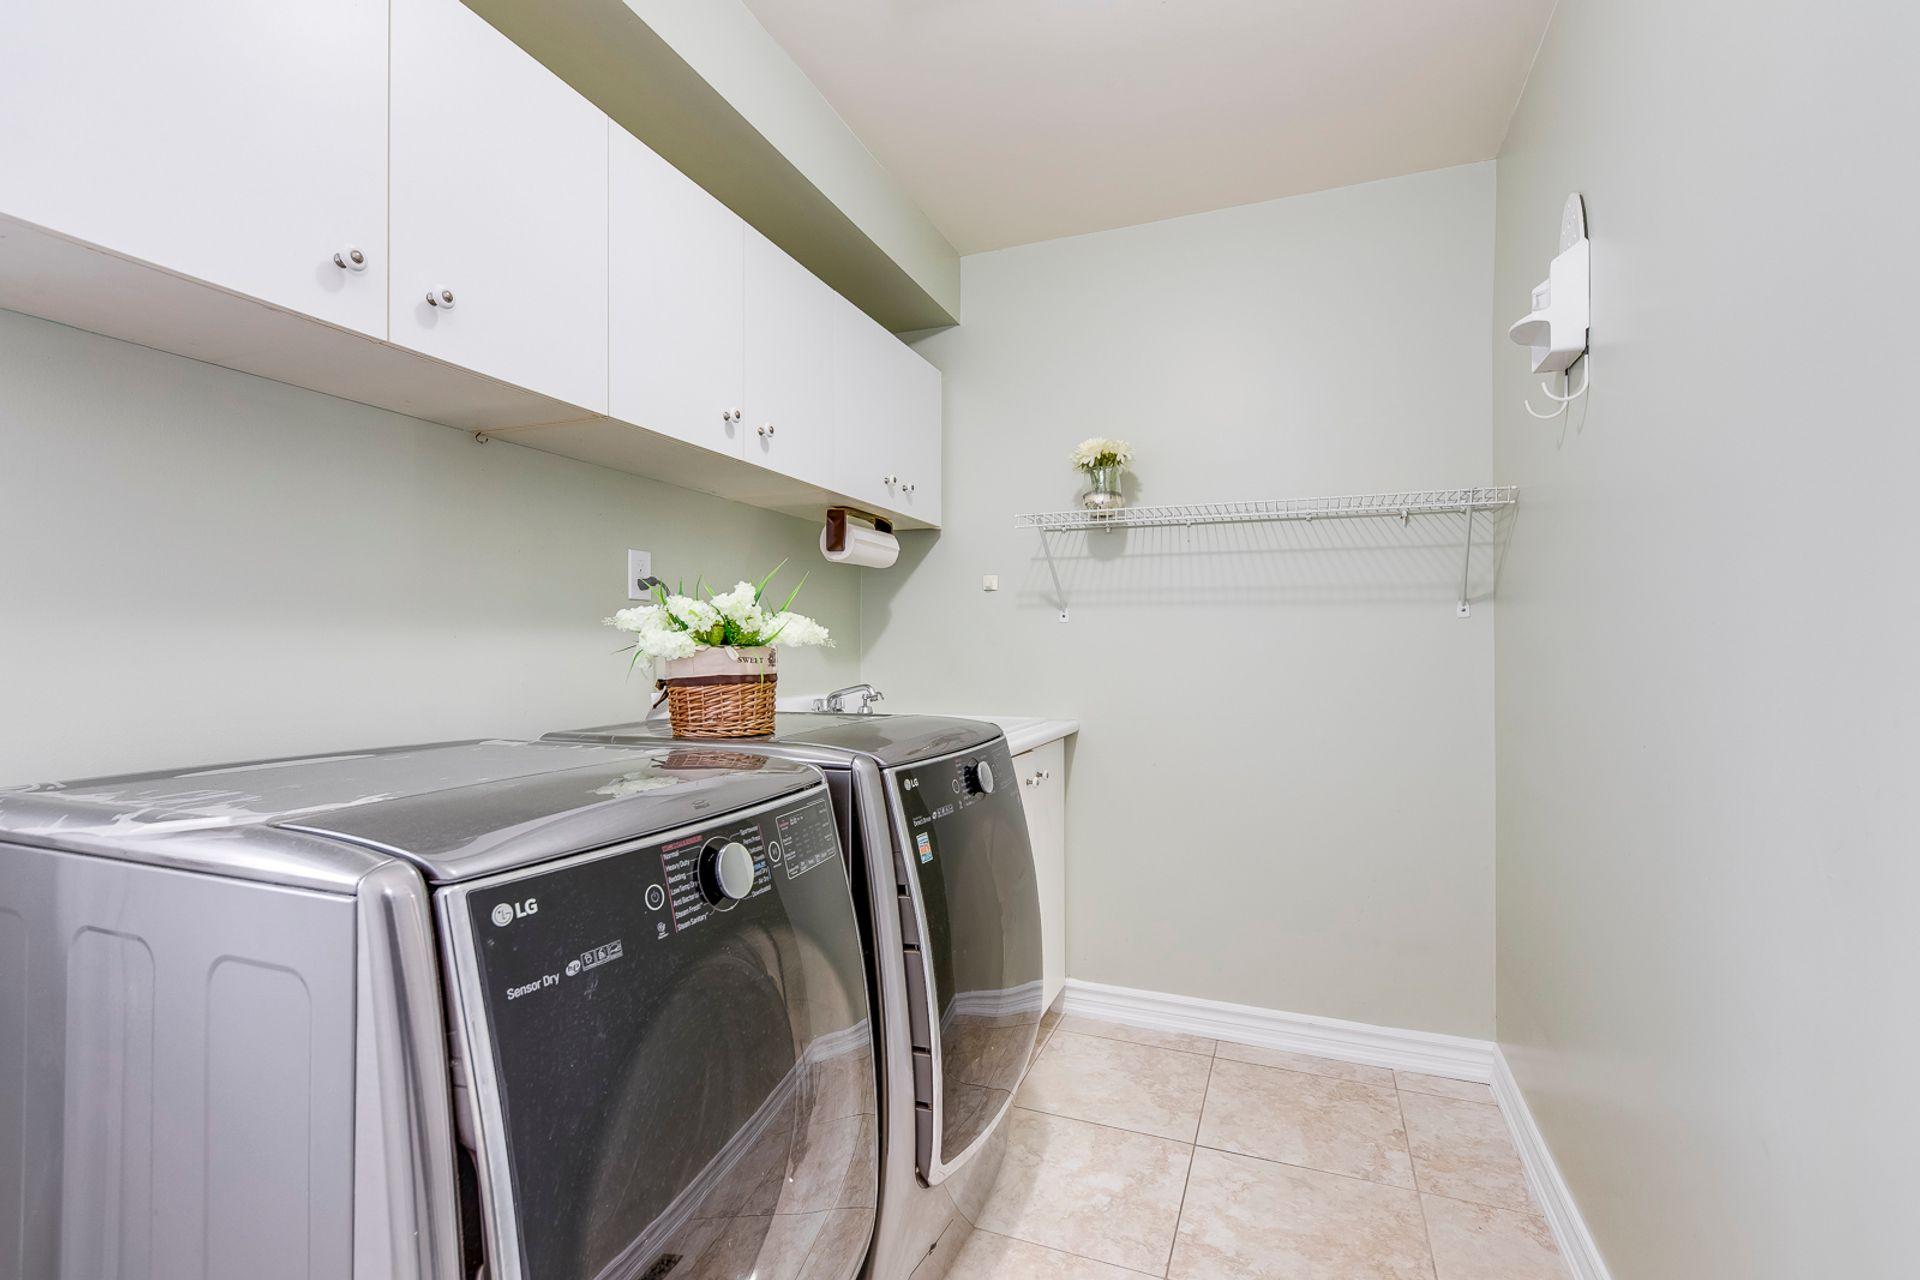 Laundry Room - 2791 Mahogany Lane, Oakville - Elite3 & Team at 2791 Mahogany Lane, Clearview, Oakville